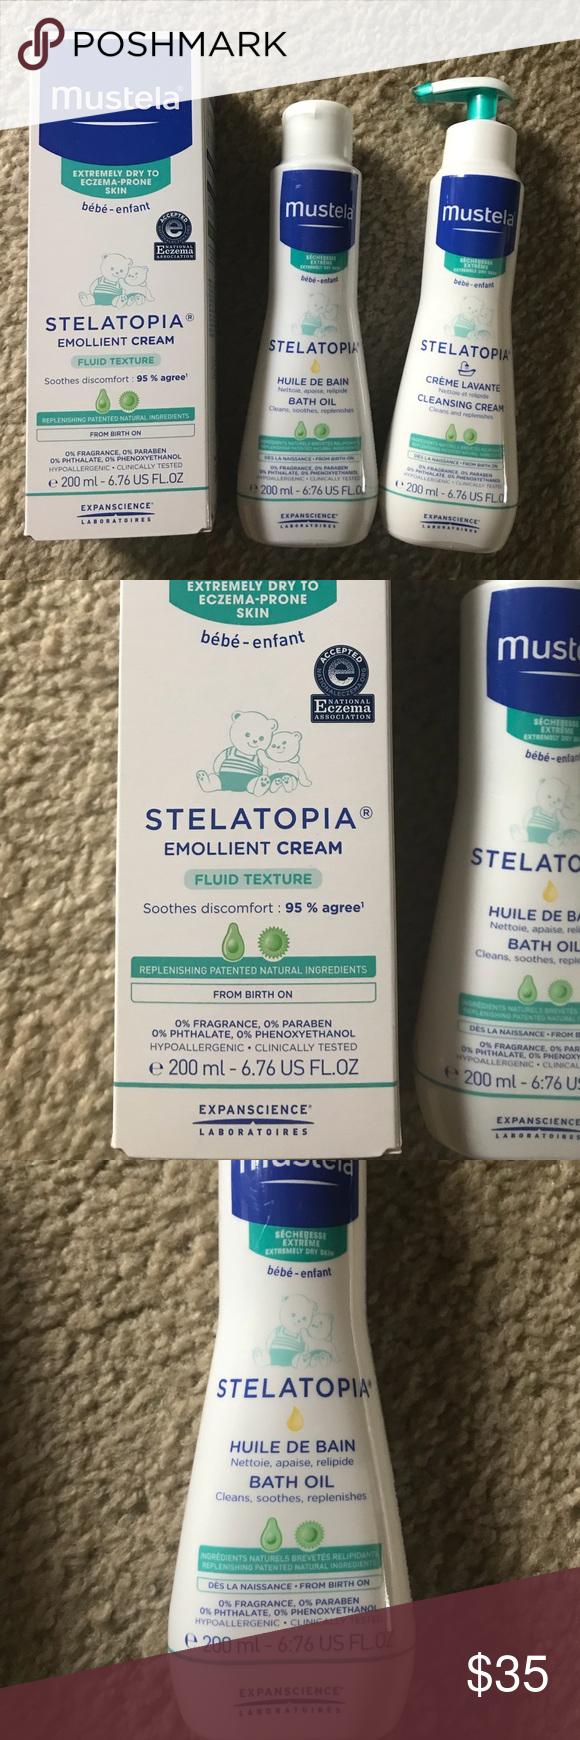 New In Box Mustela Stelatopia Eczema Bath Set 676 Oz Oil Emollient Cream